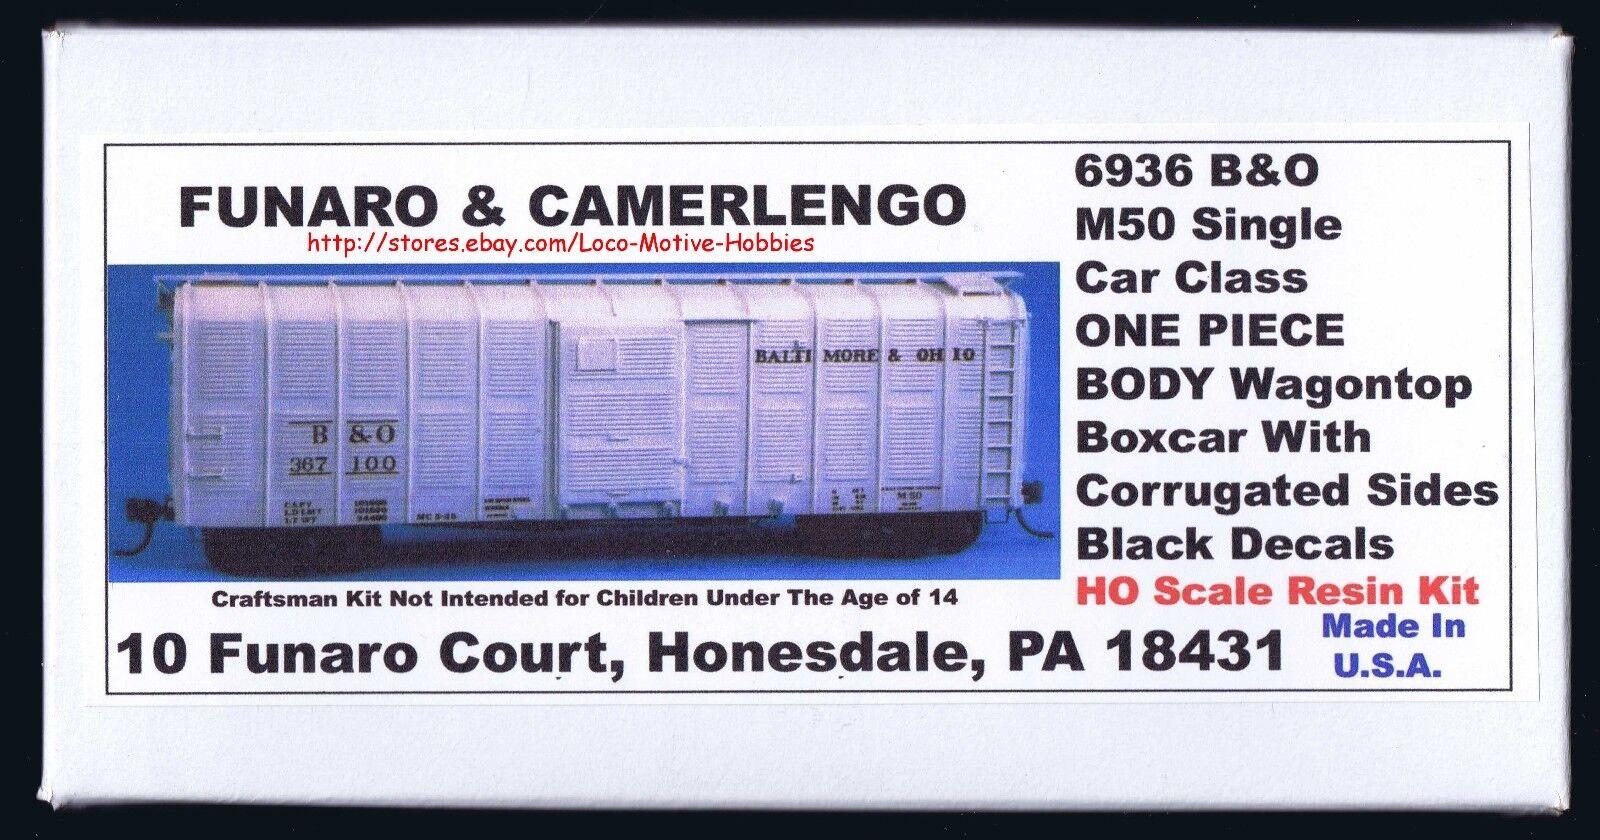 Funaro F&C 6936 BALTIMORE OHIO  WagonTop B&O Corrugated Sheathing Boxcar 1-PIECE